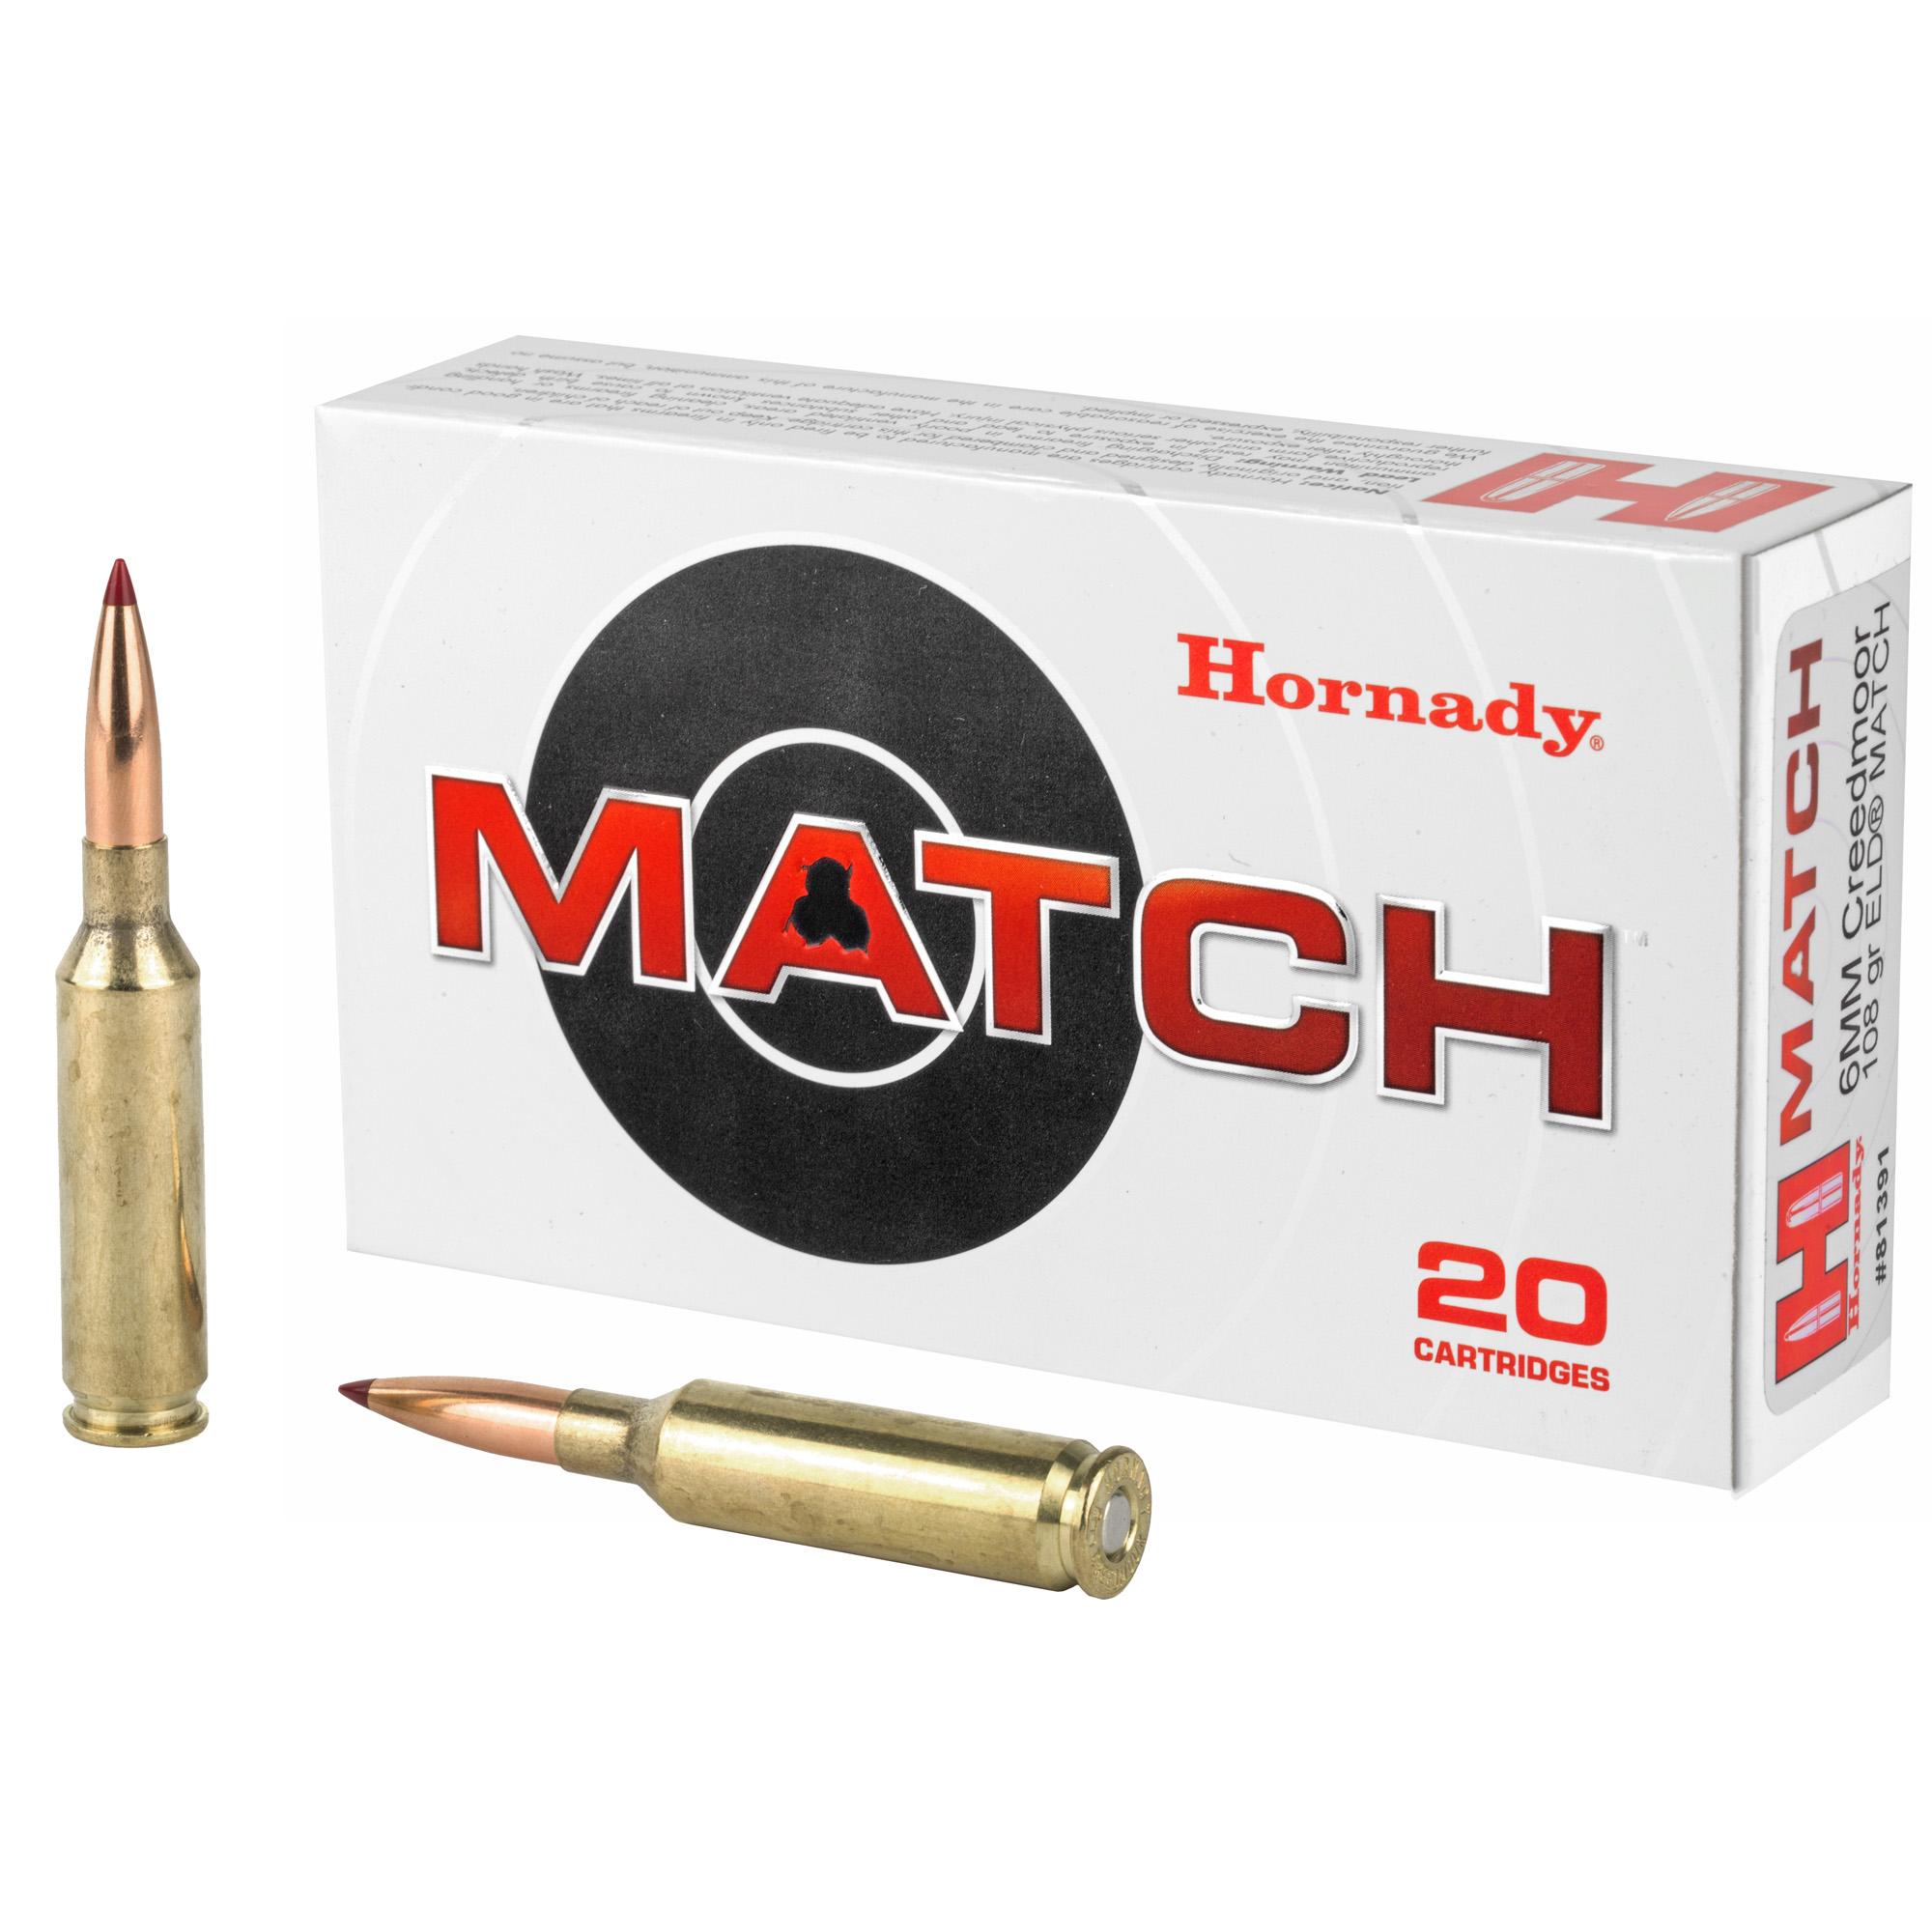 Hrndy 6mm Creed 108gr Eld-m 20/200